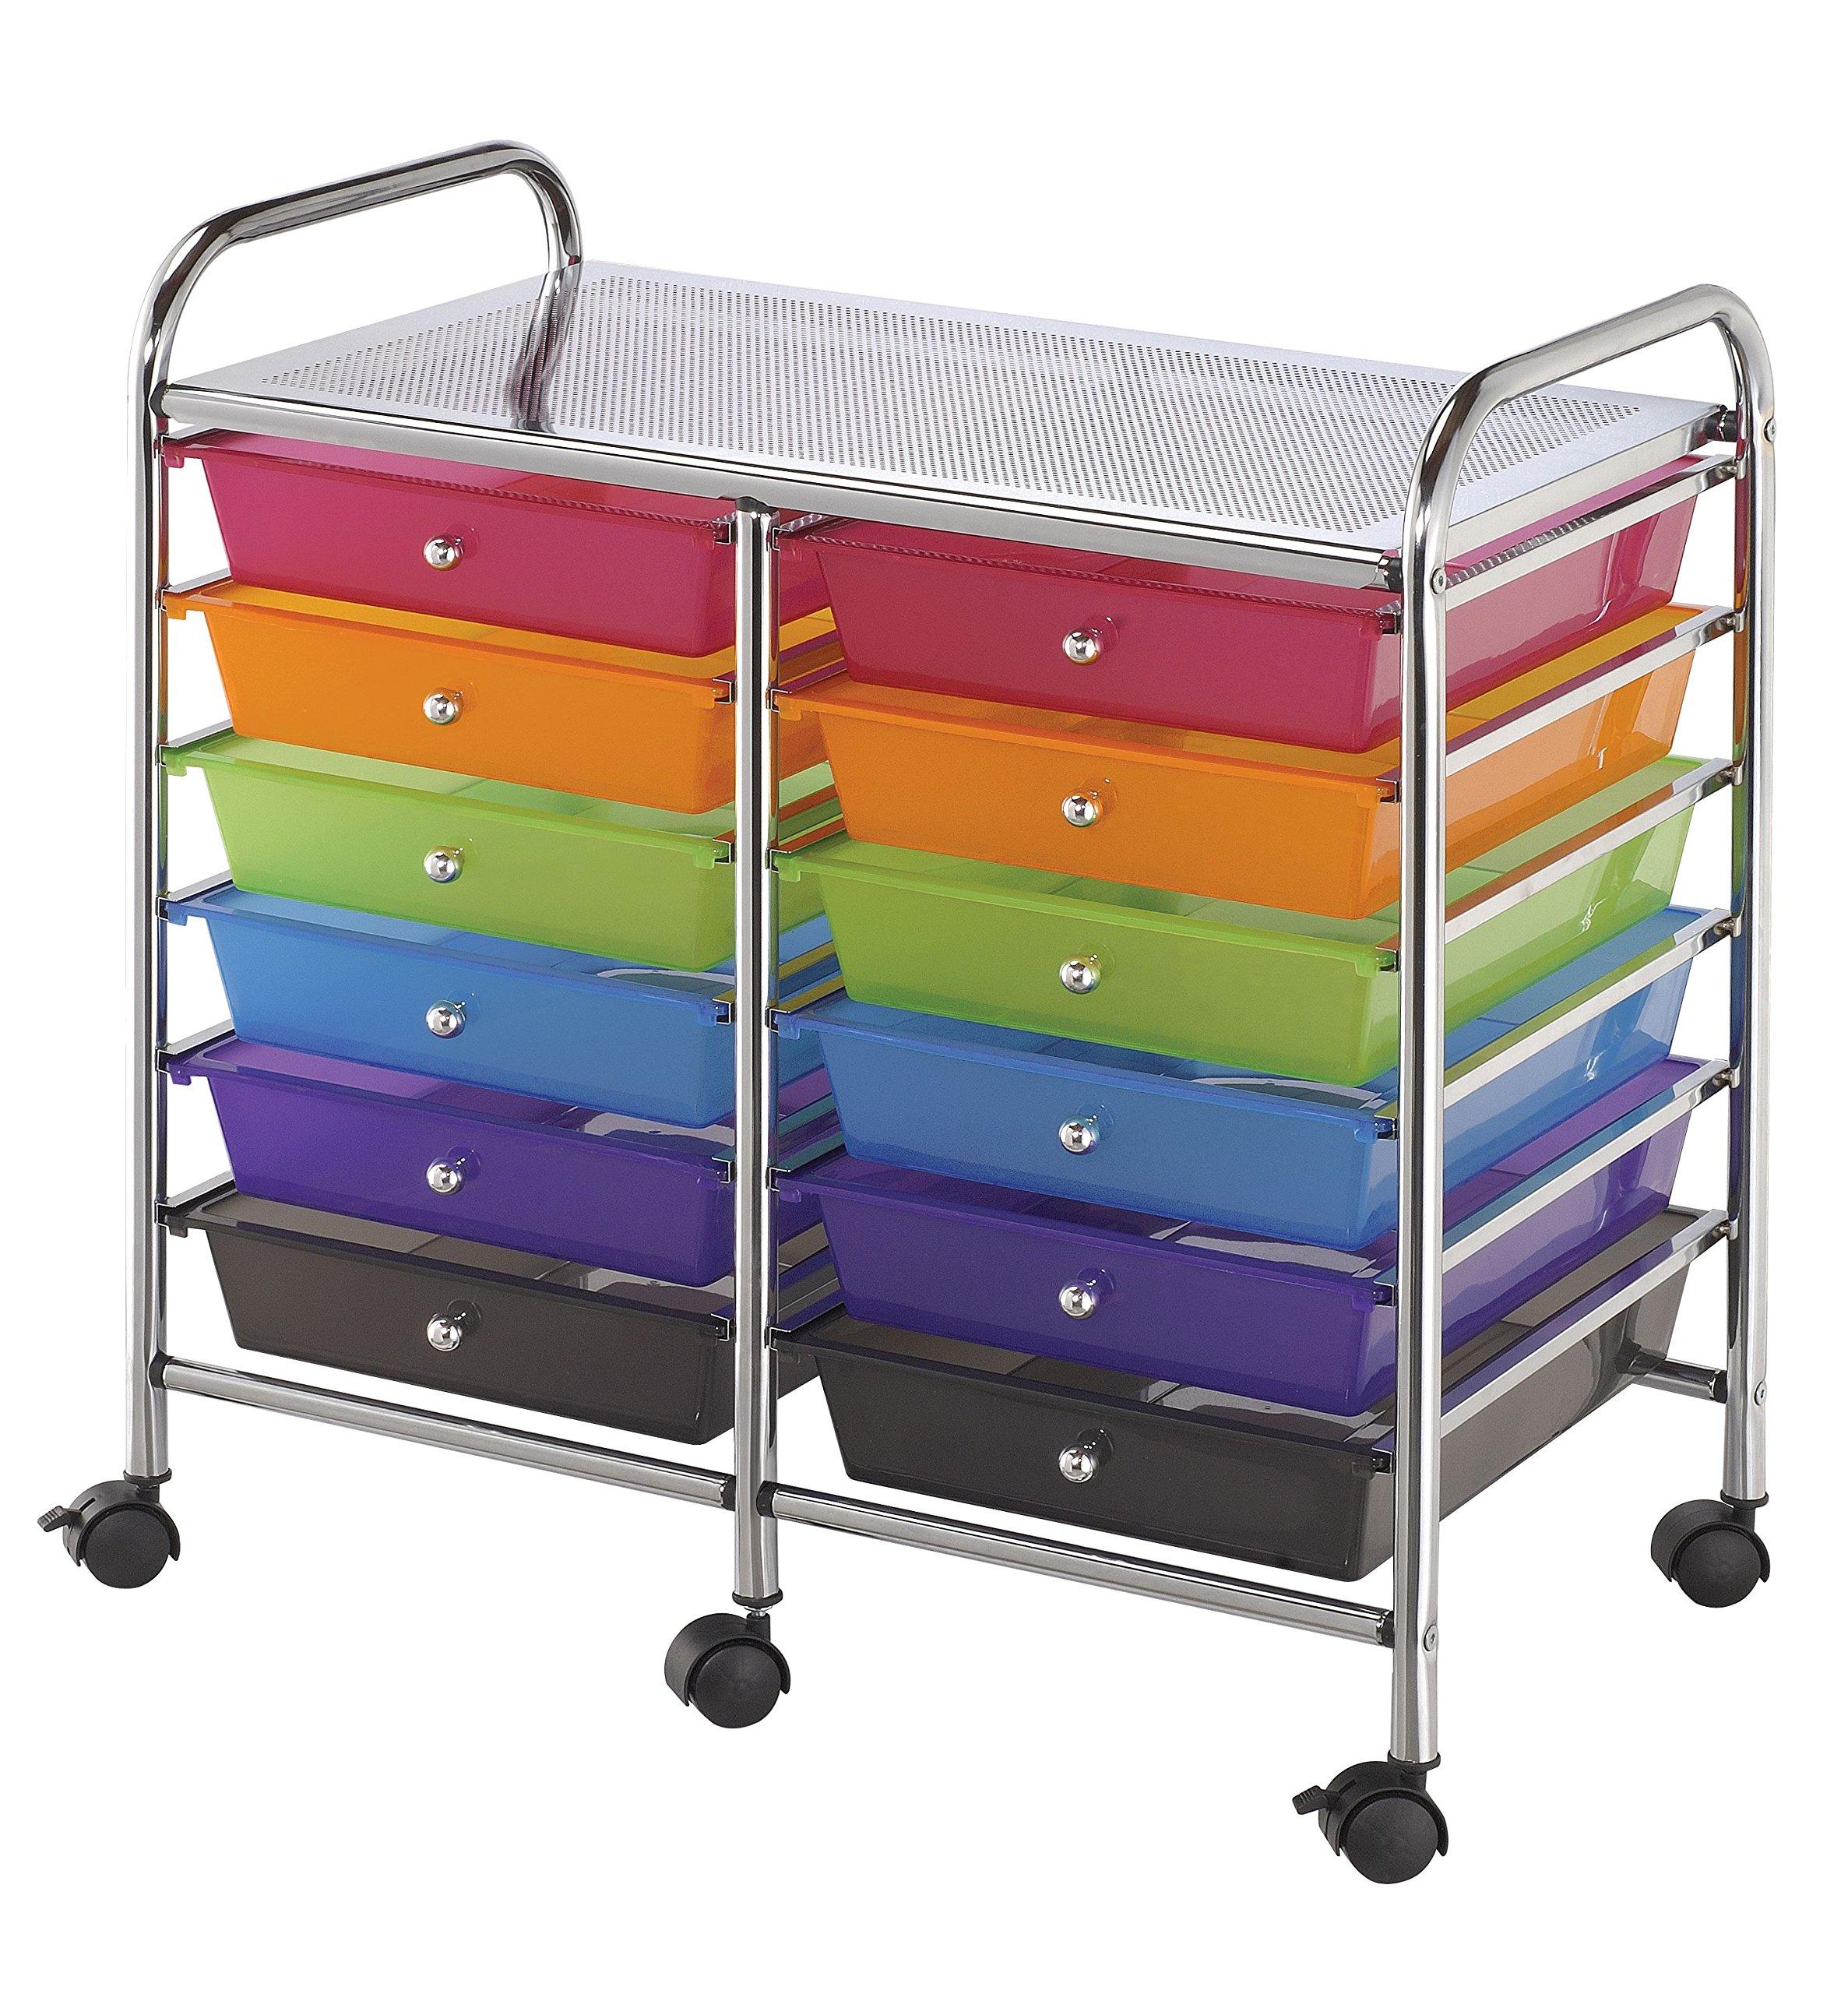 Storage CART 12 DWR Multicolor by Alvin